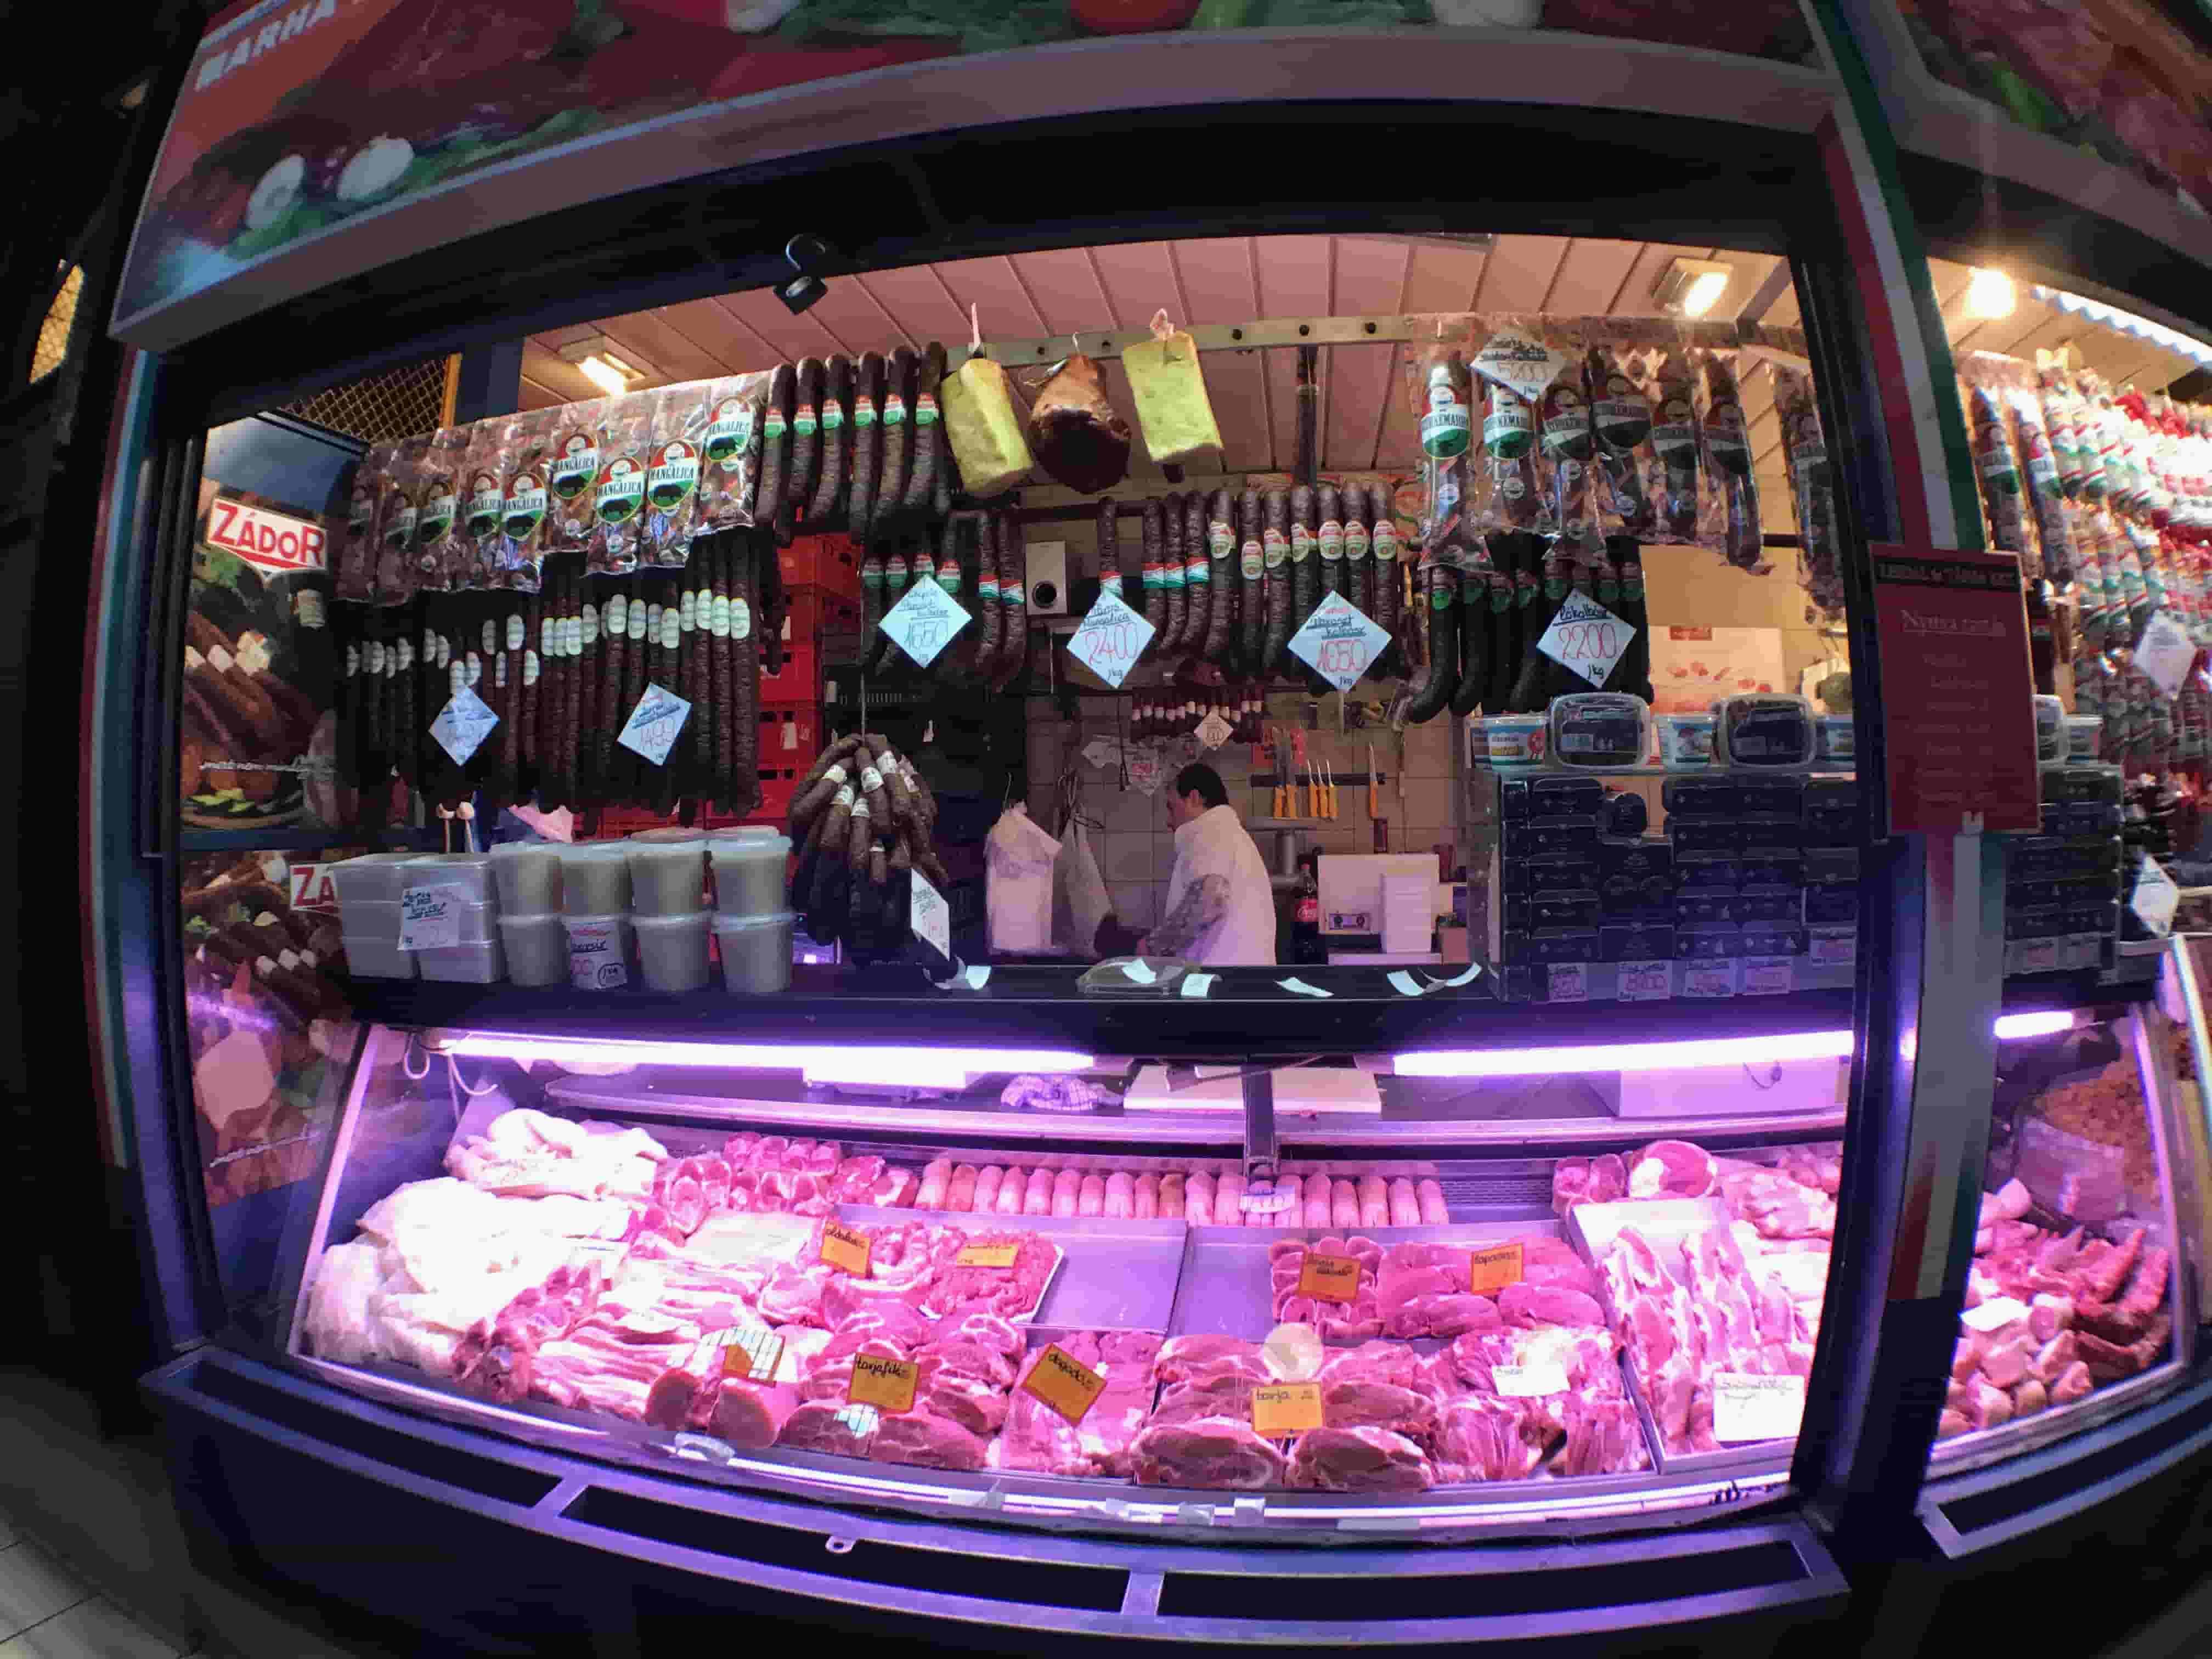 mangalica pork great market